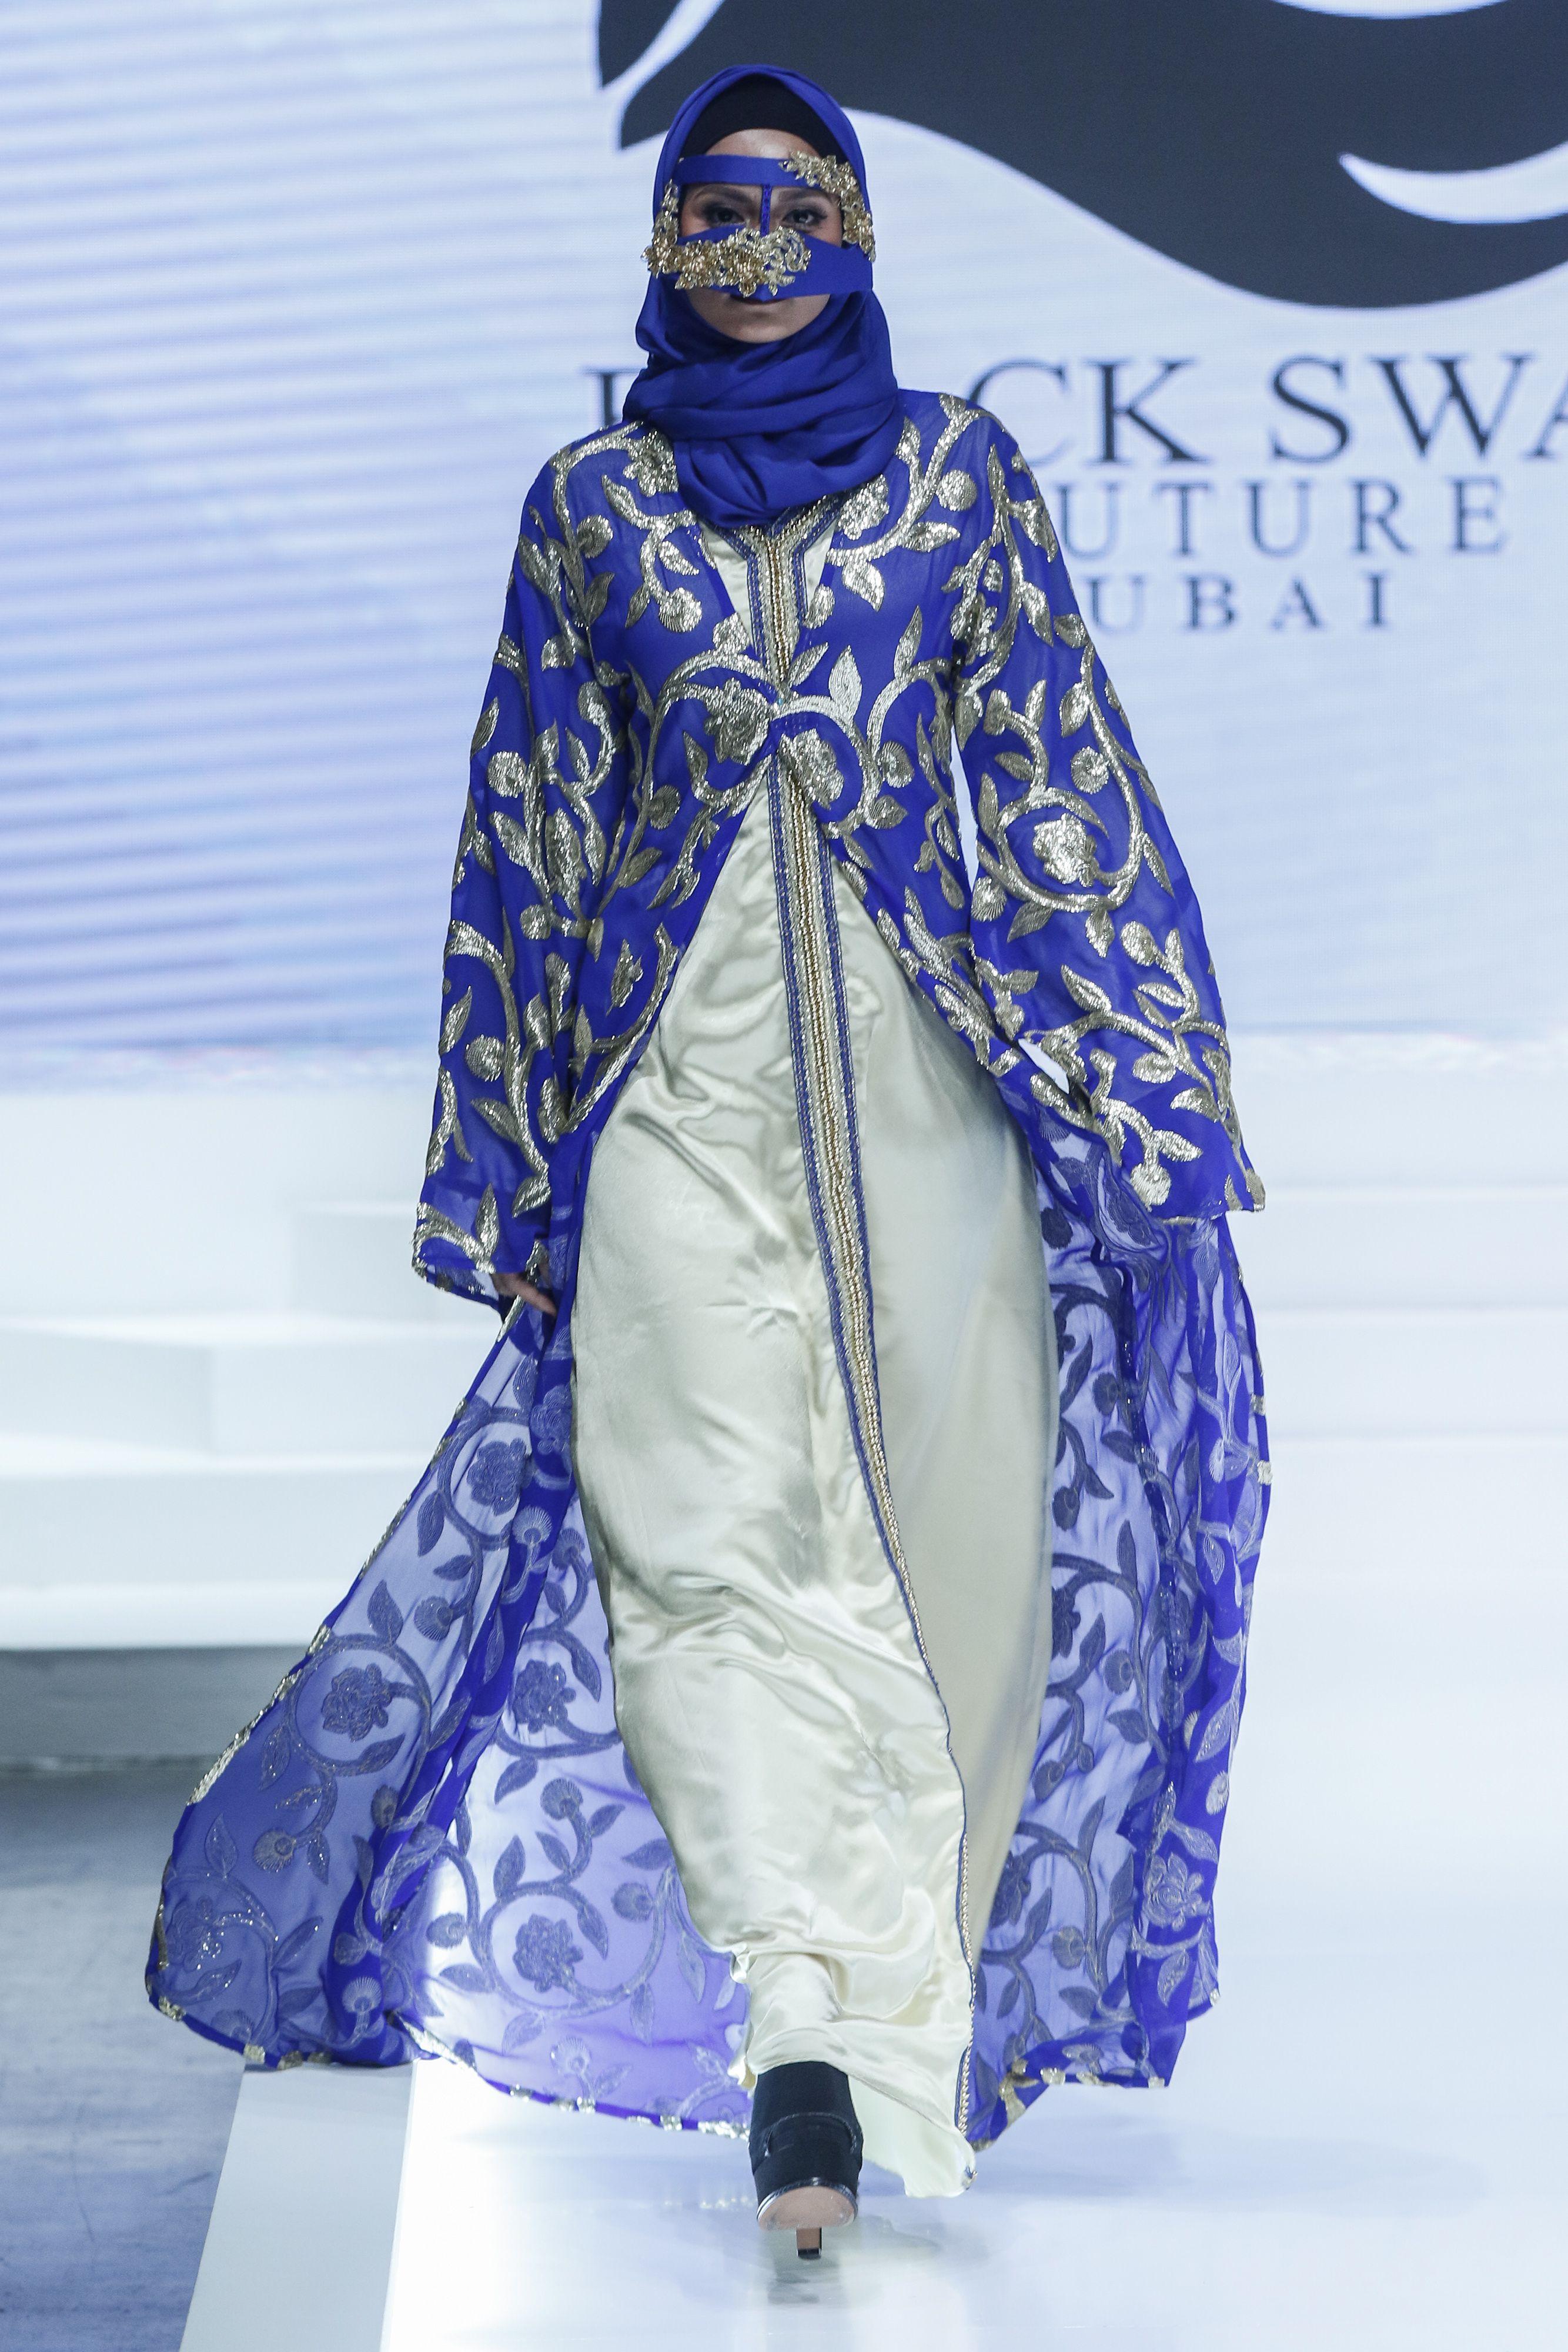 Black swan hijabfashion catwalk fashiondesign muslim